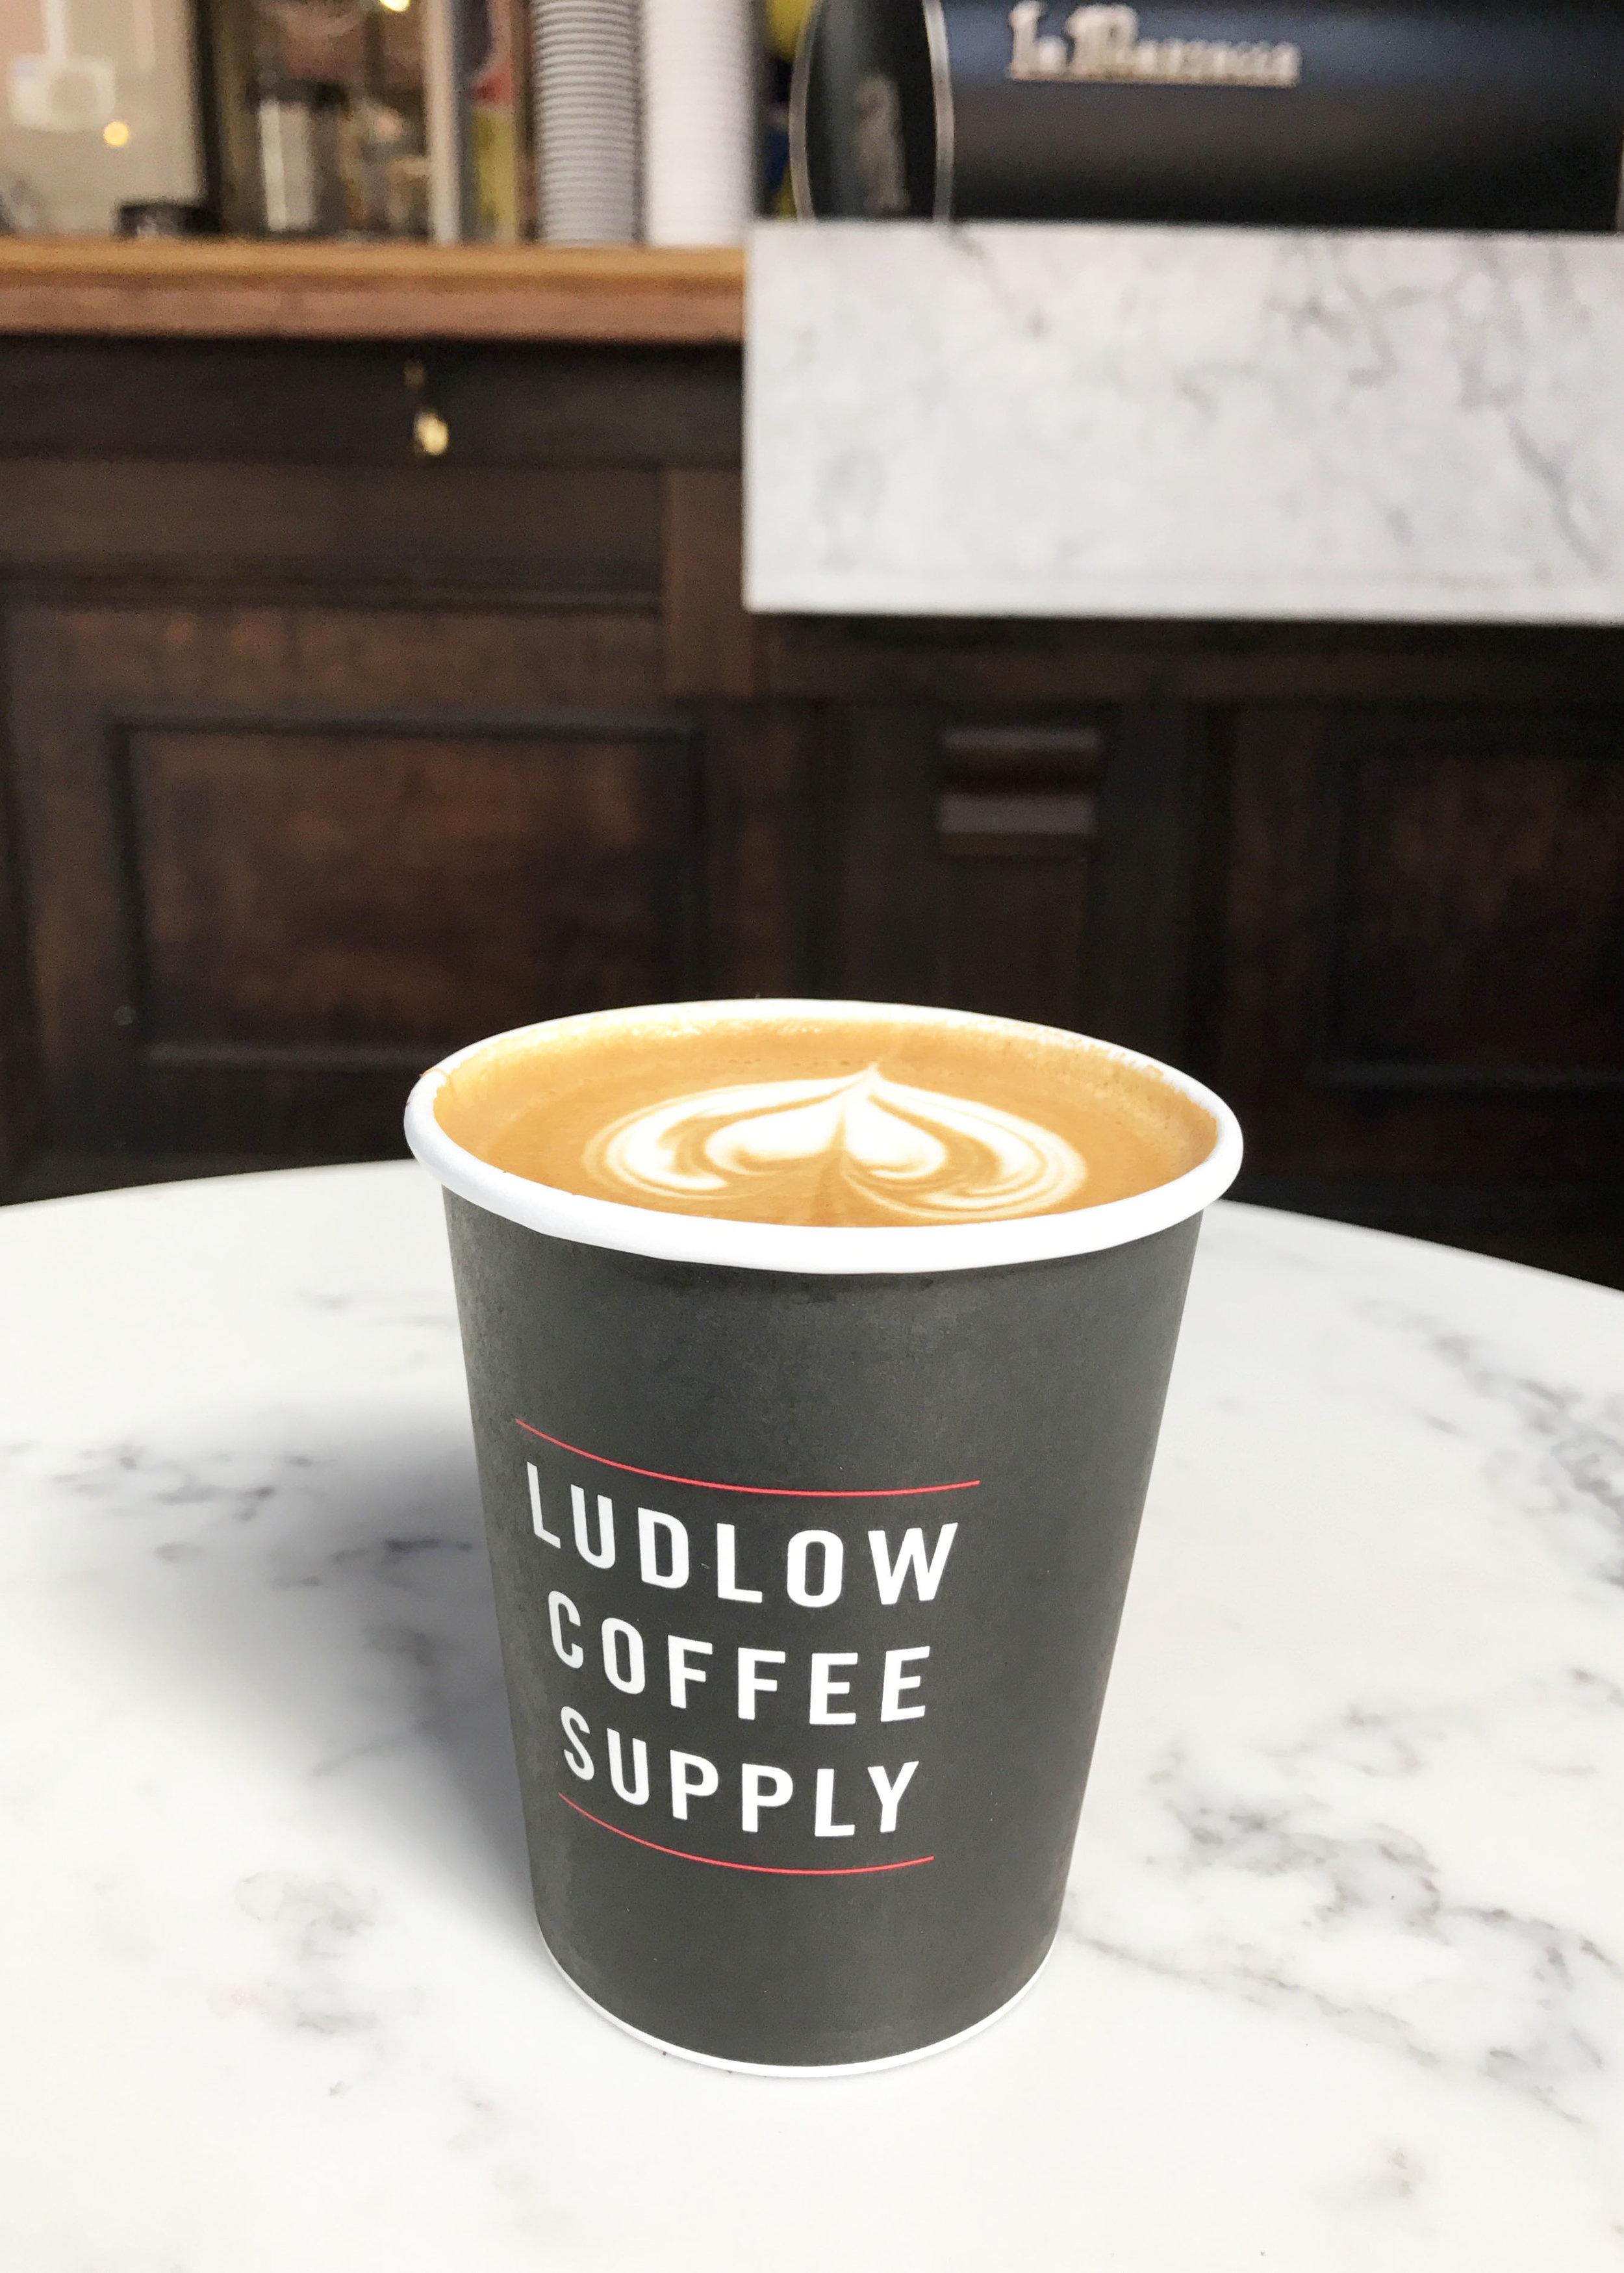 Ludlow Coffee Supply 2.jpg